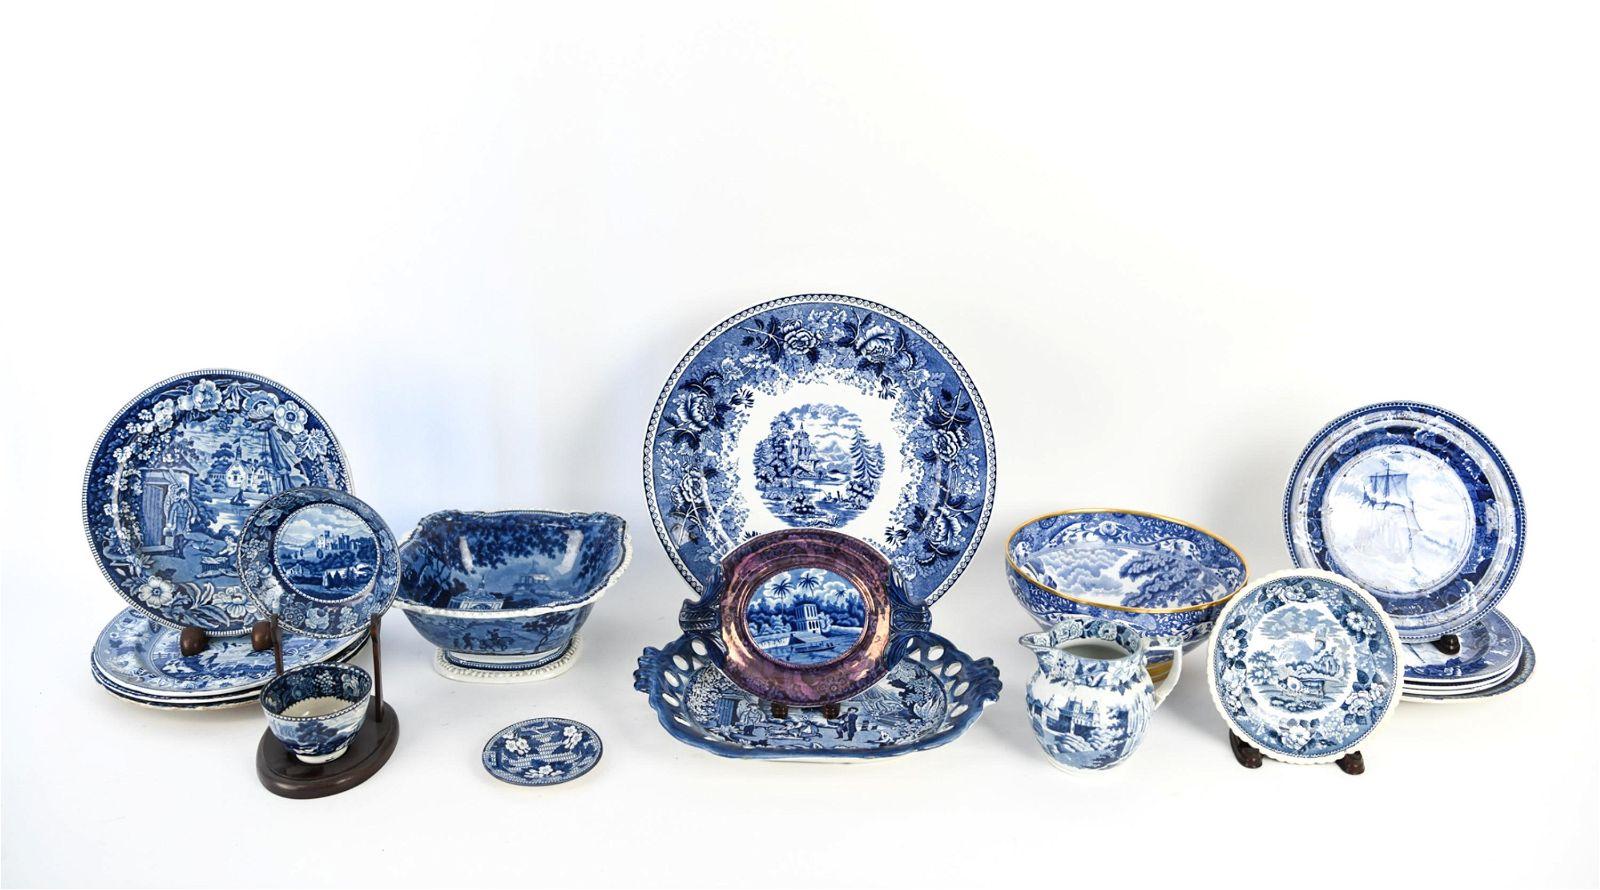 GROUPING OF ANTIQUE BLUE & WHITE CERAMICS